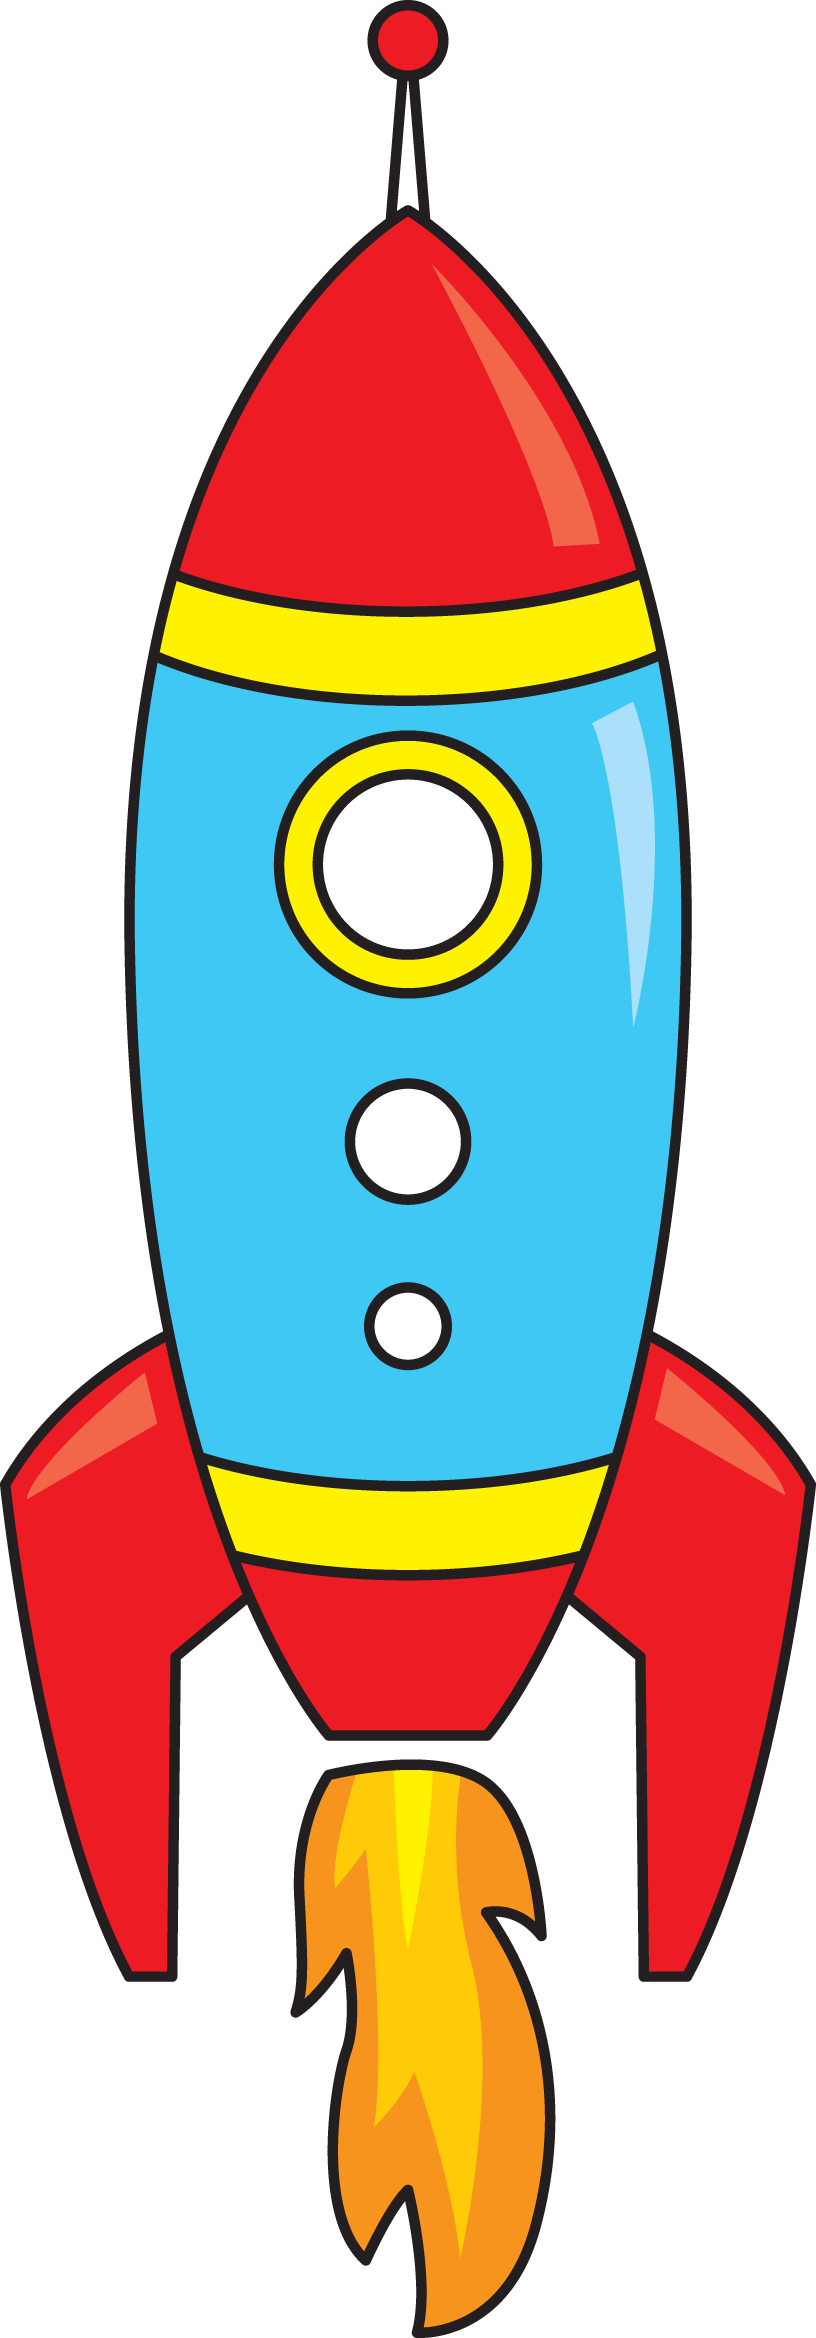 816x2338 Rocket Clipart Group